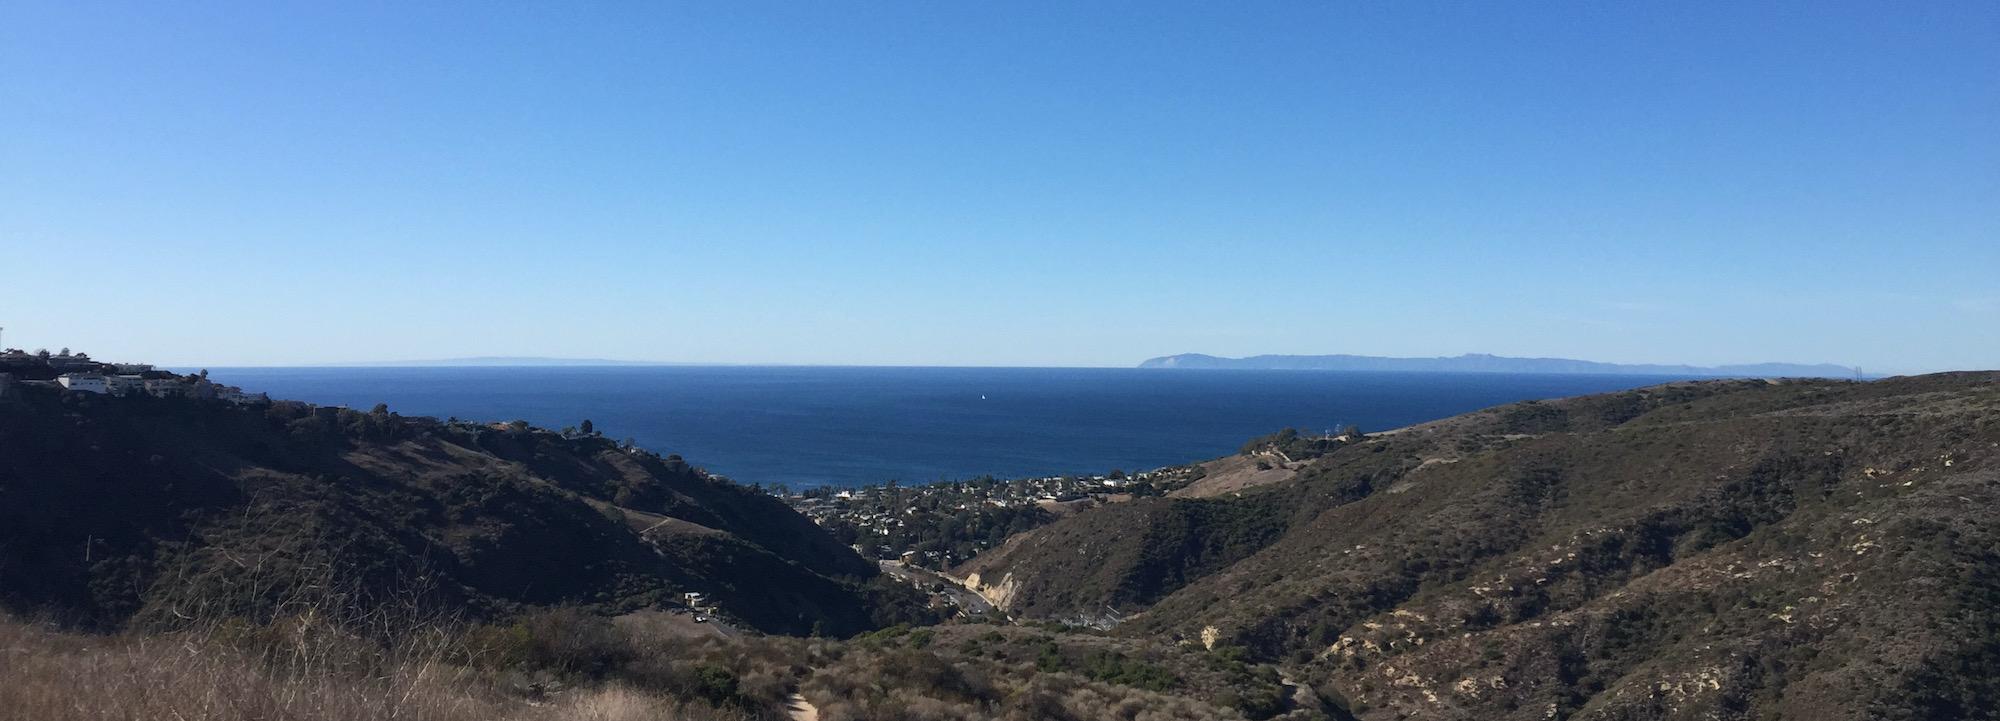 Gratitude 2020 - Canyon Acres Trail - Laguna Beach